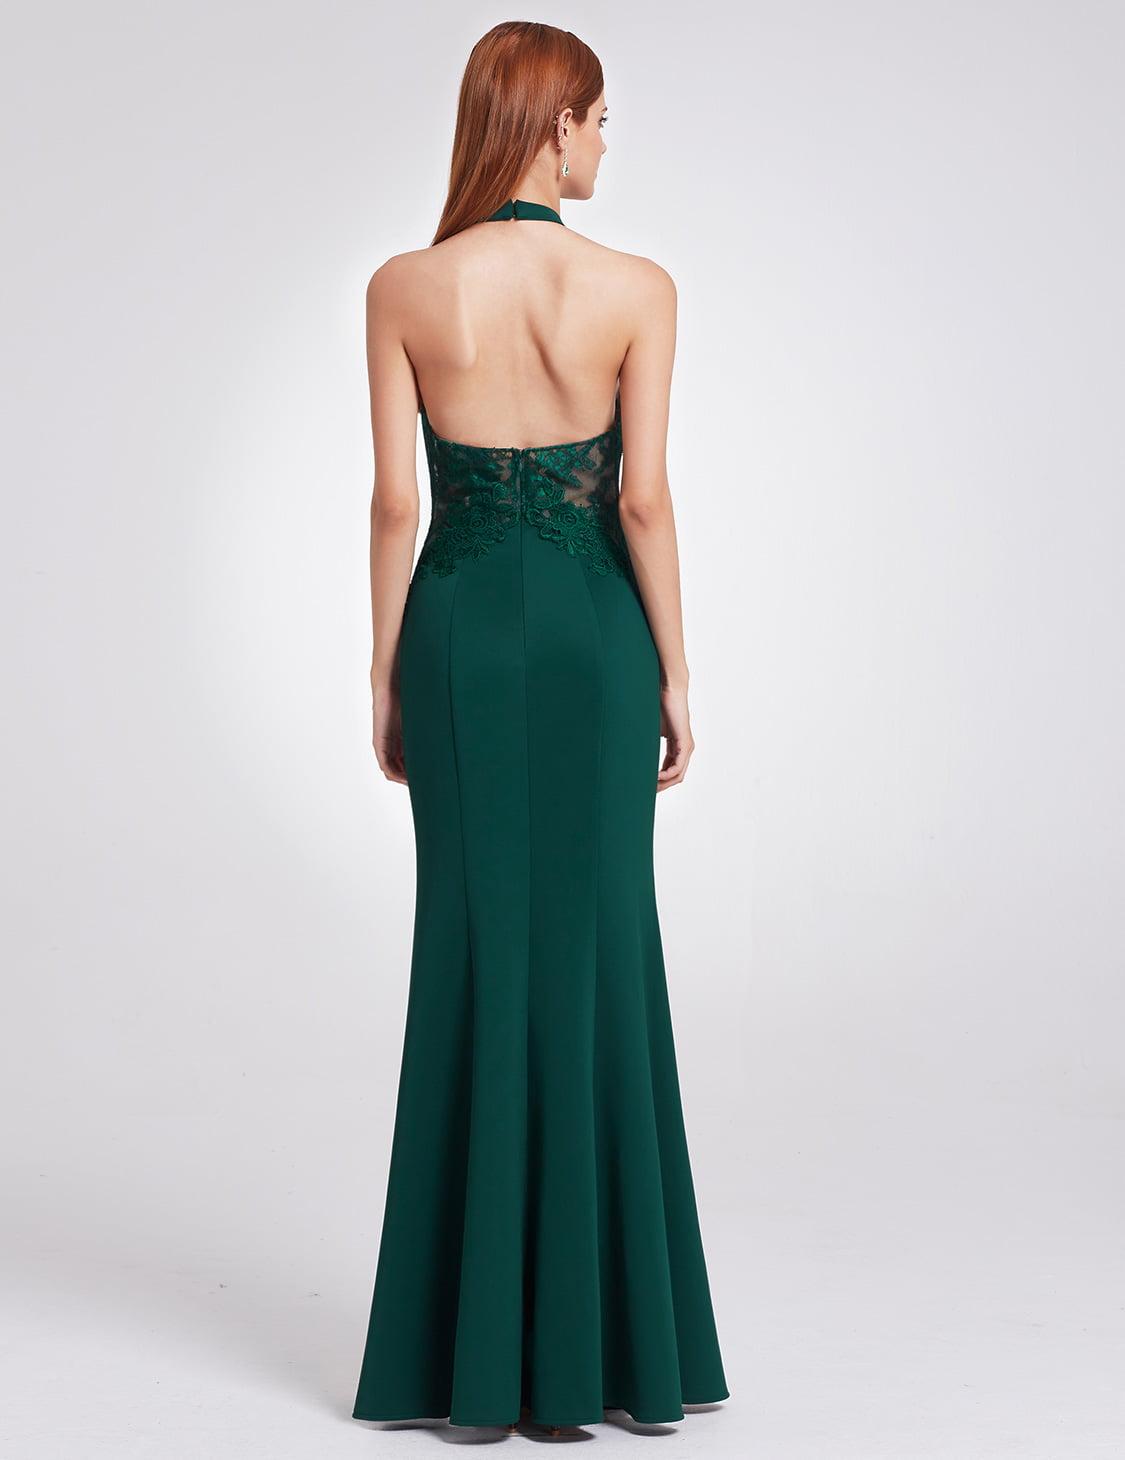 US Long Plus Halter Lace Applique Gown Ball Formal Evening Party Dresses 07189